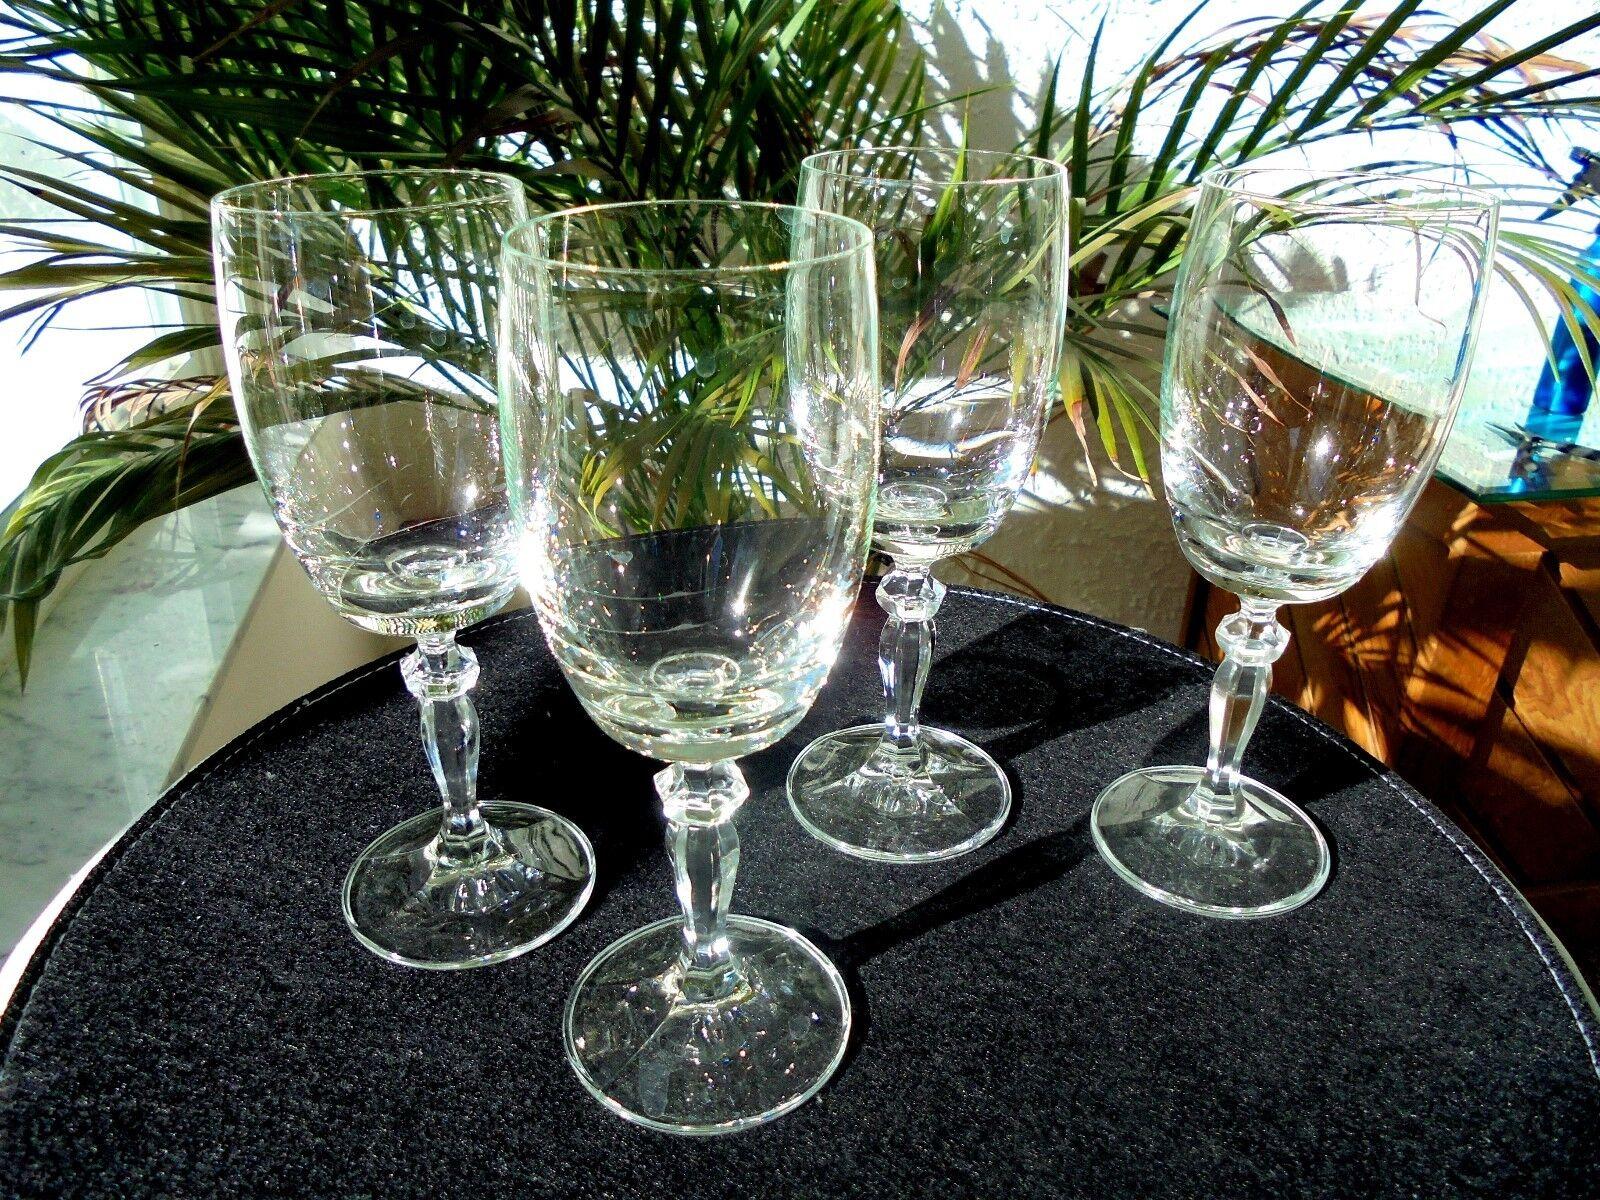 Set of 4 Clear Crystal Wine Goblets Unbranded